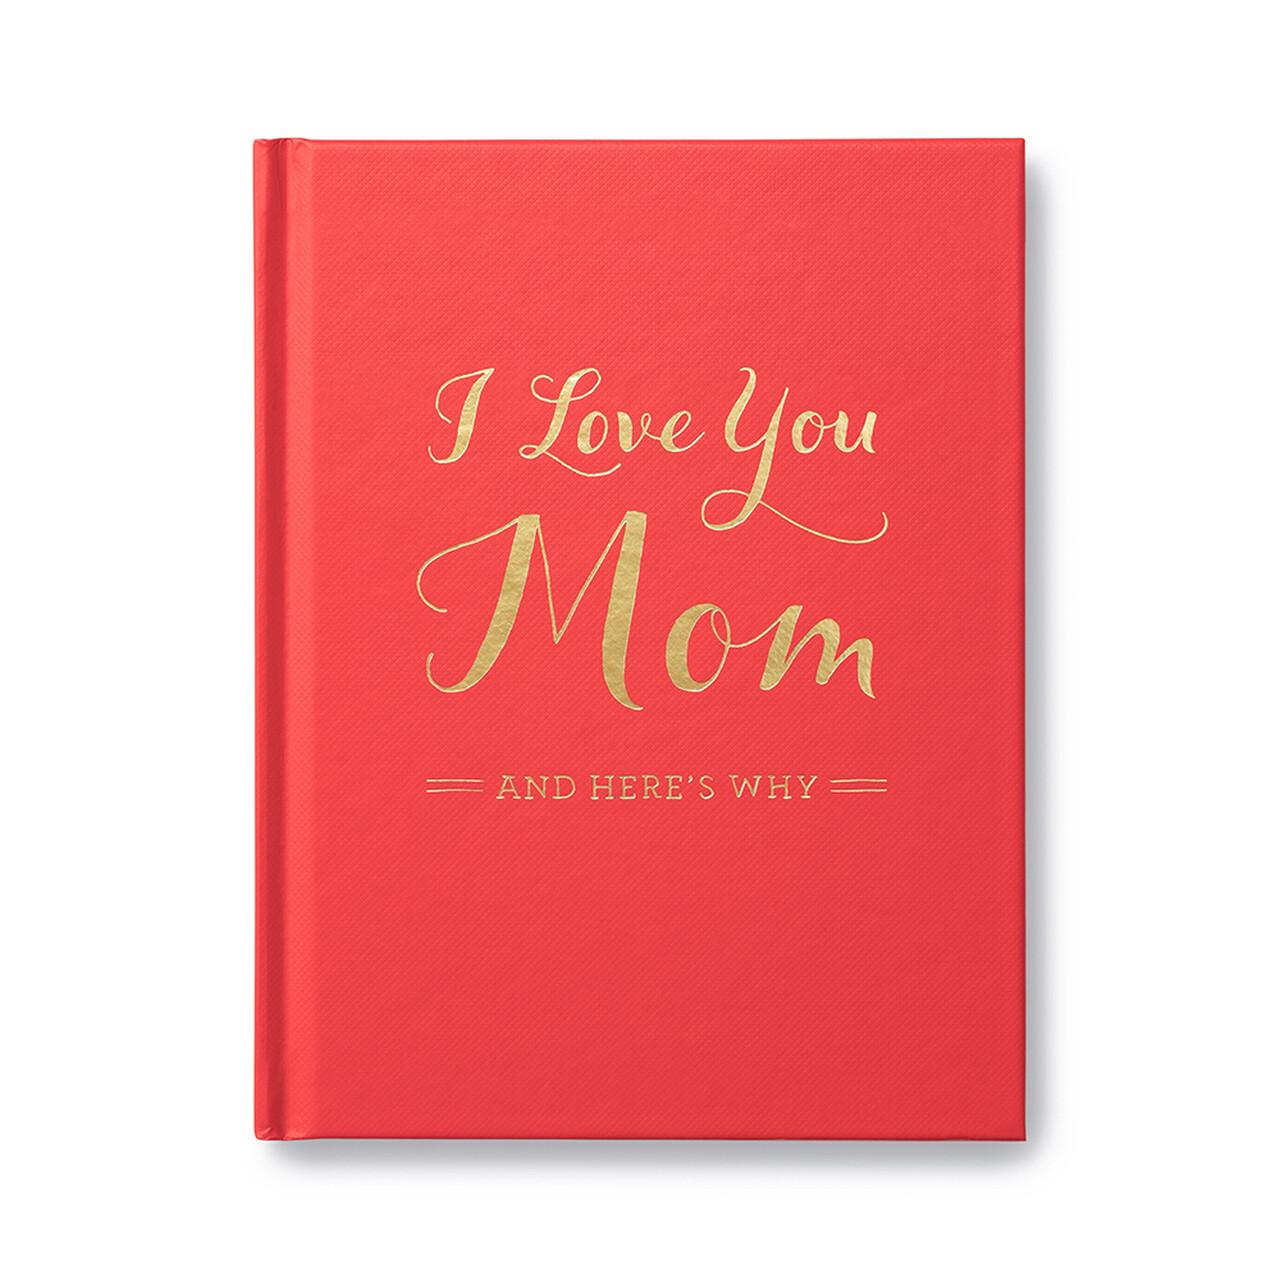 C25 I LOVE YOU MOM